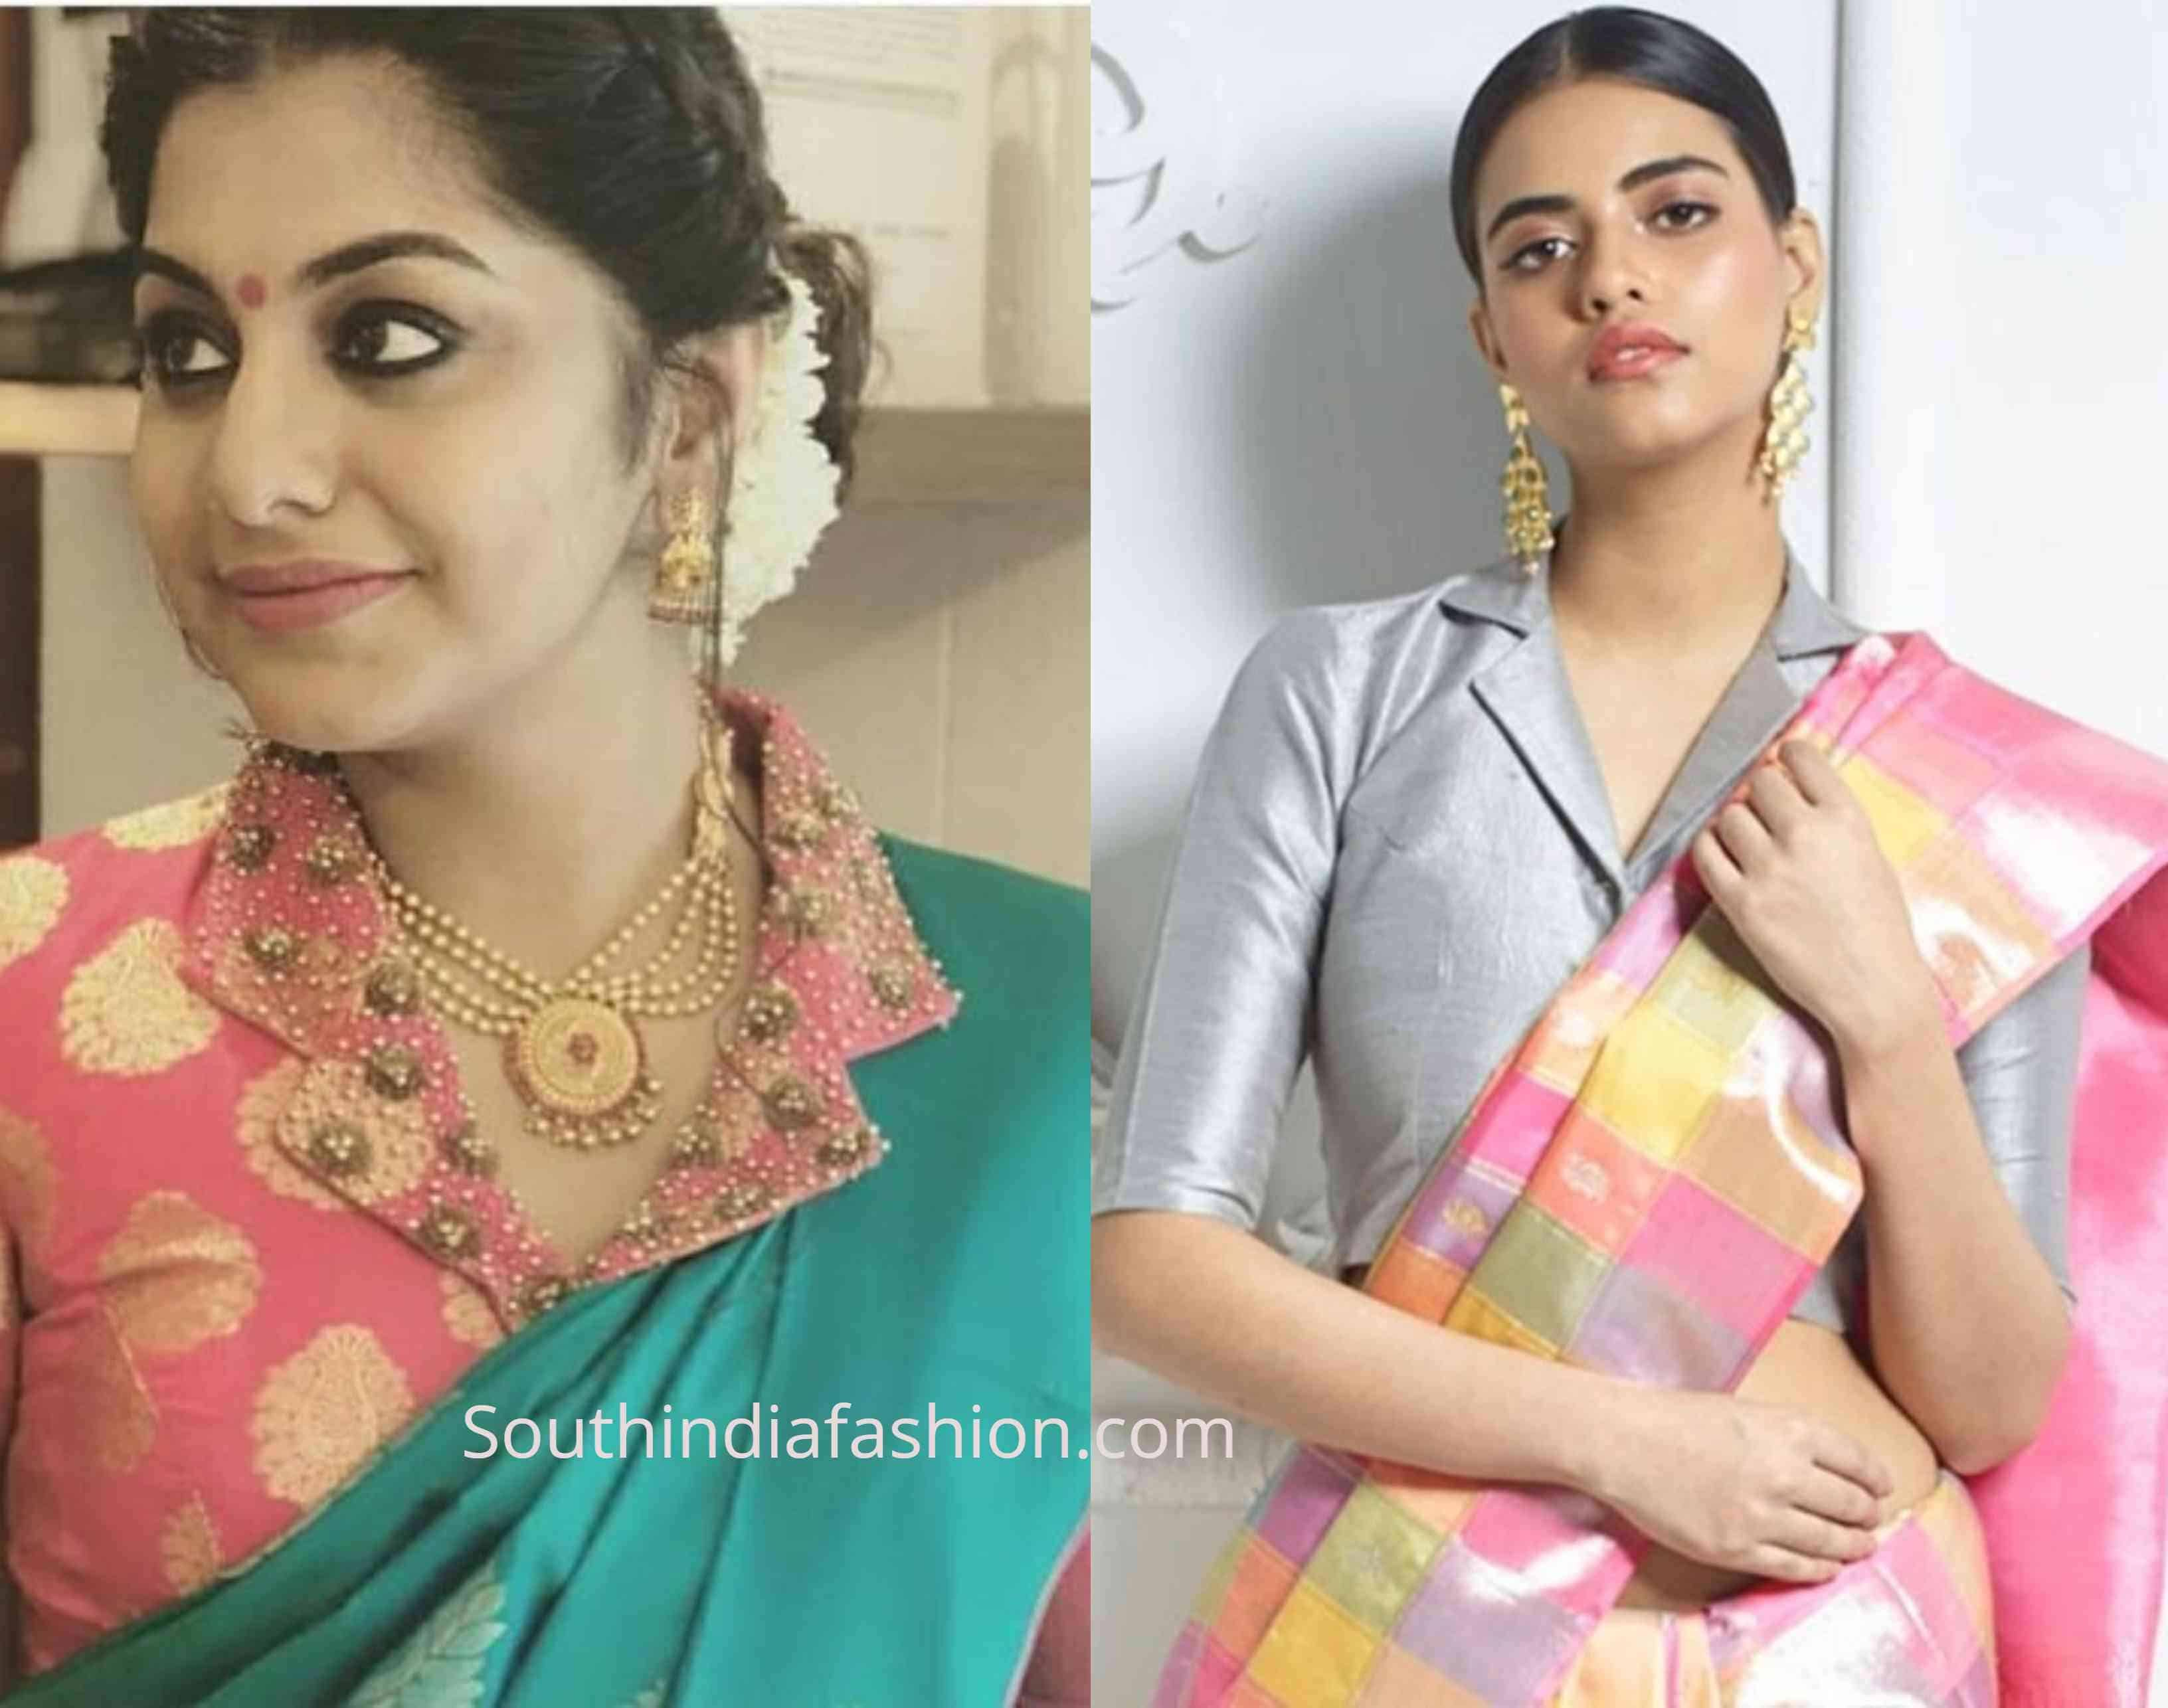 New Blouse Designs 2019 Latest Silk Saree Blouse Designs Saree Blouse Designs Silk Saree Blouse Designs New Blouse Designs